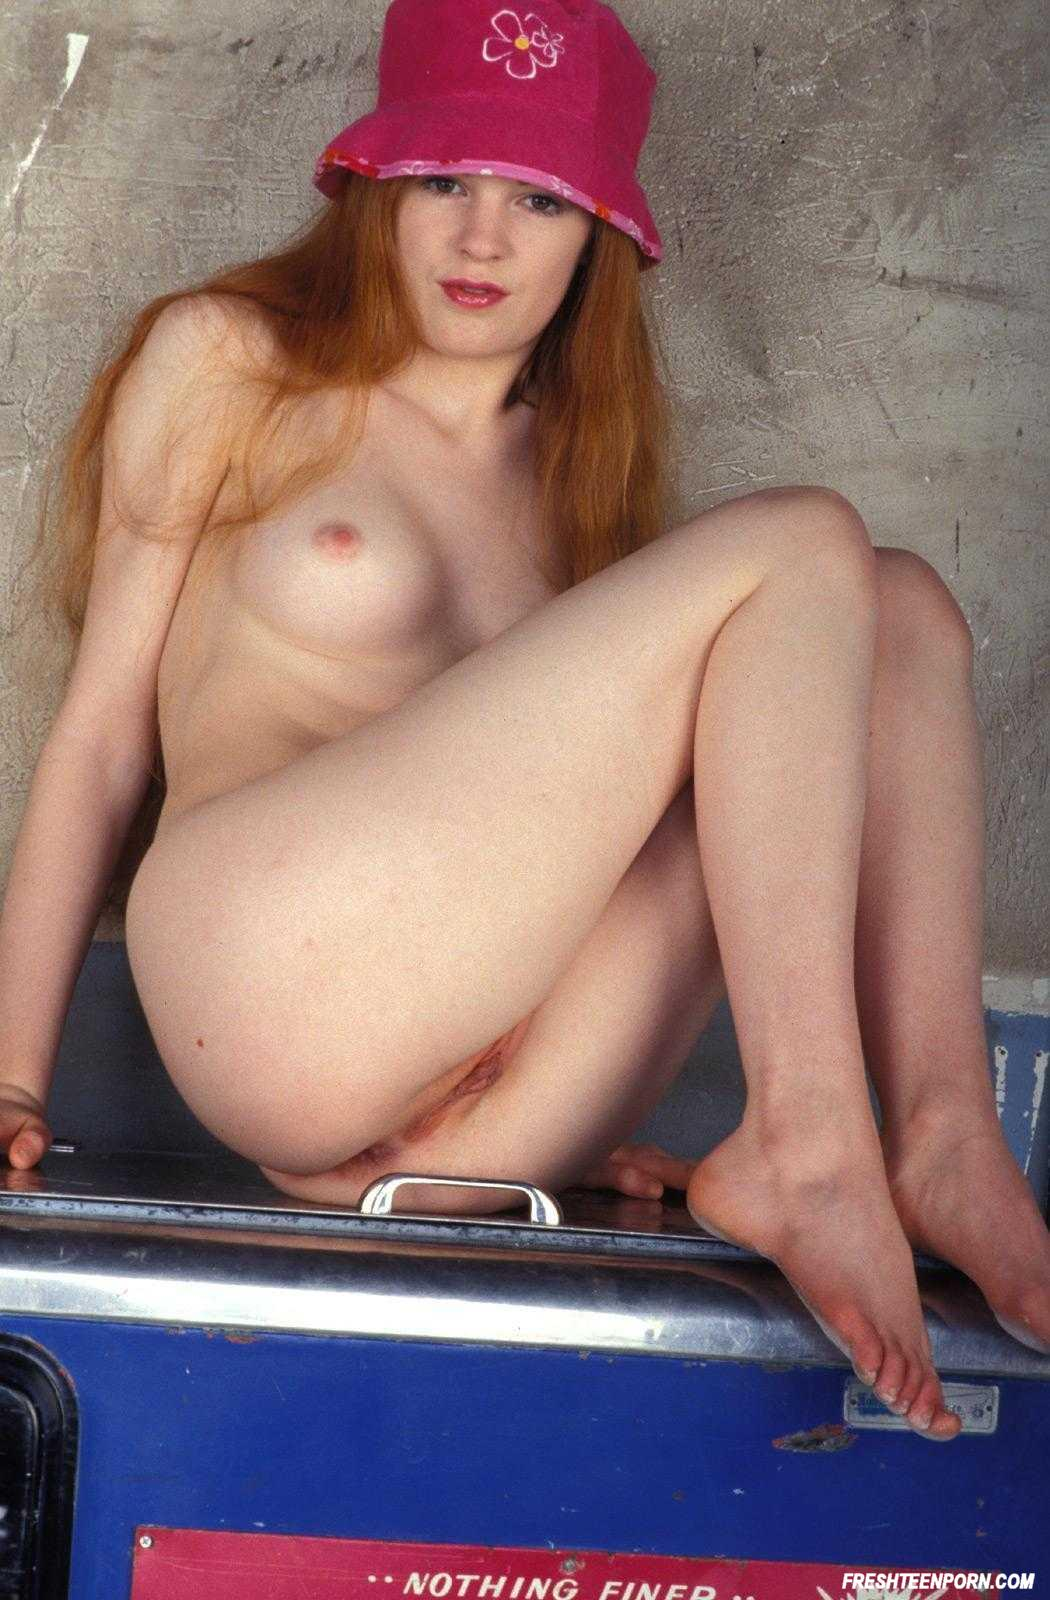 Sweet Redhead Nicole Scott Nude 3363 - Page 2-7384